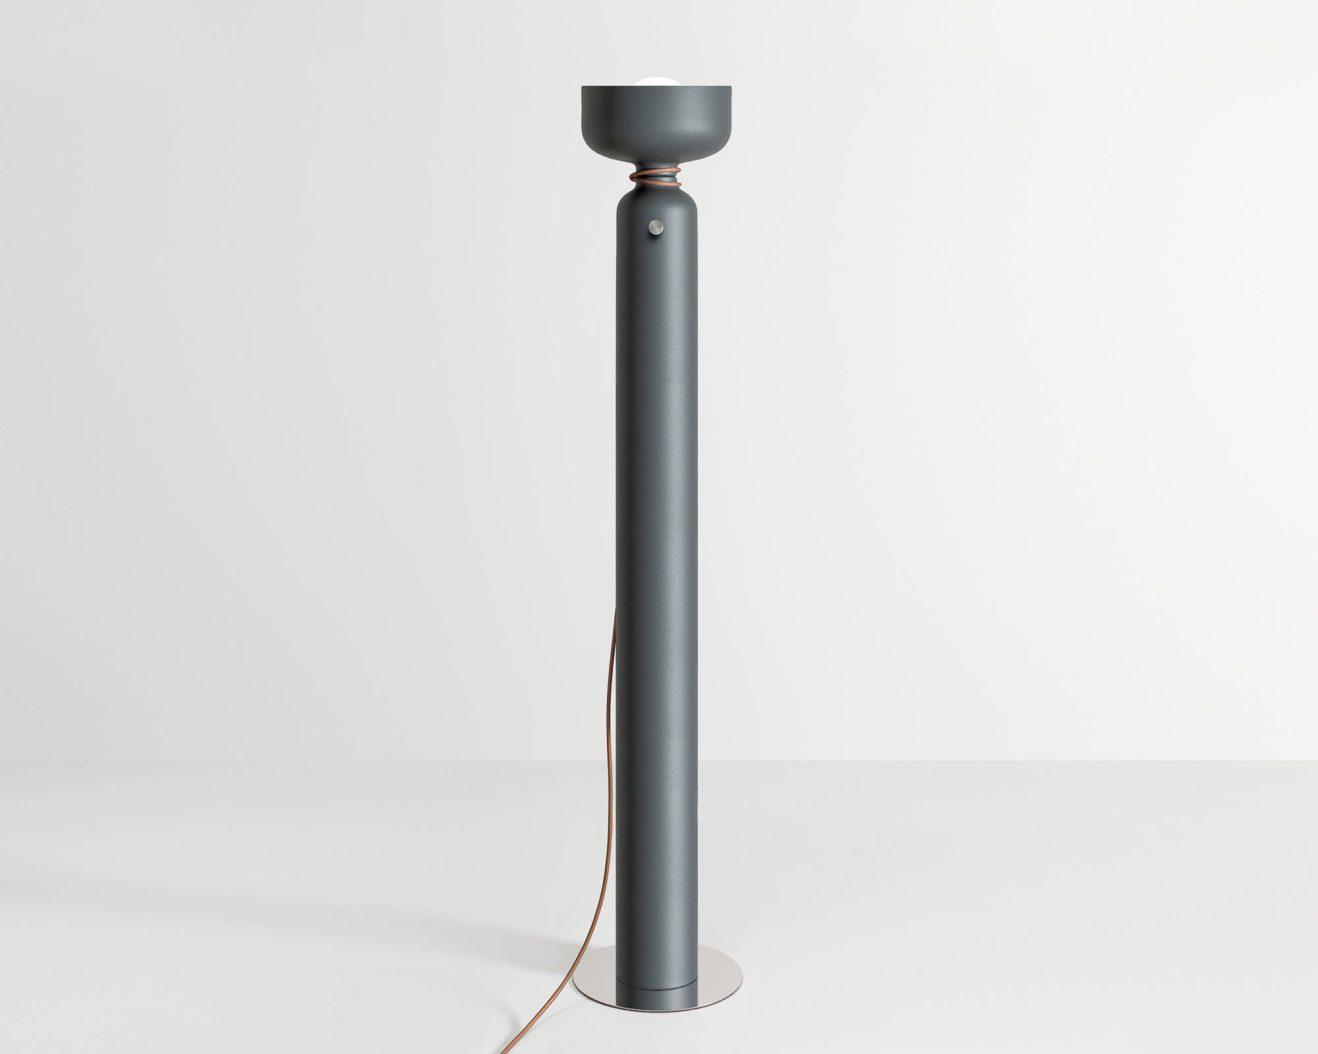 2-Andlight-Floor Lamp-A Vanilla-Savannah Bay Gallery